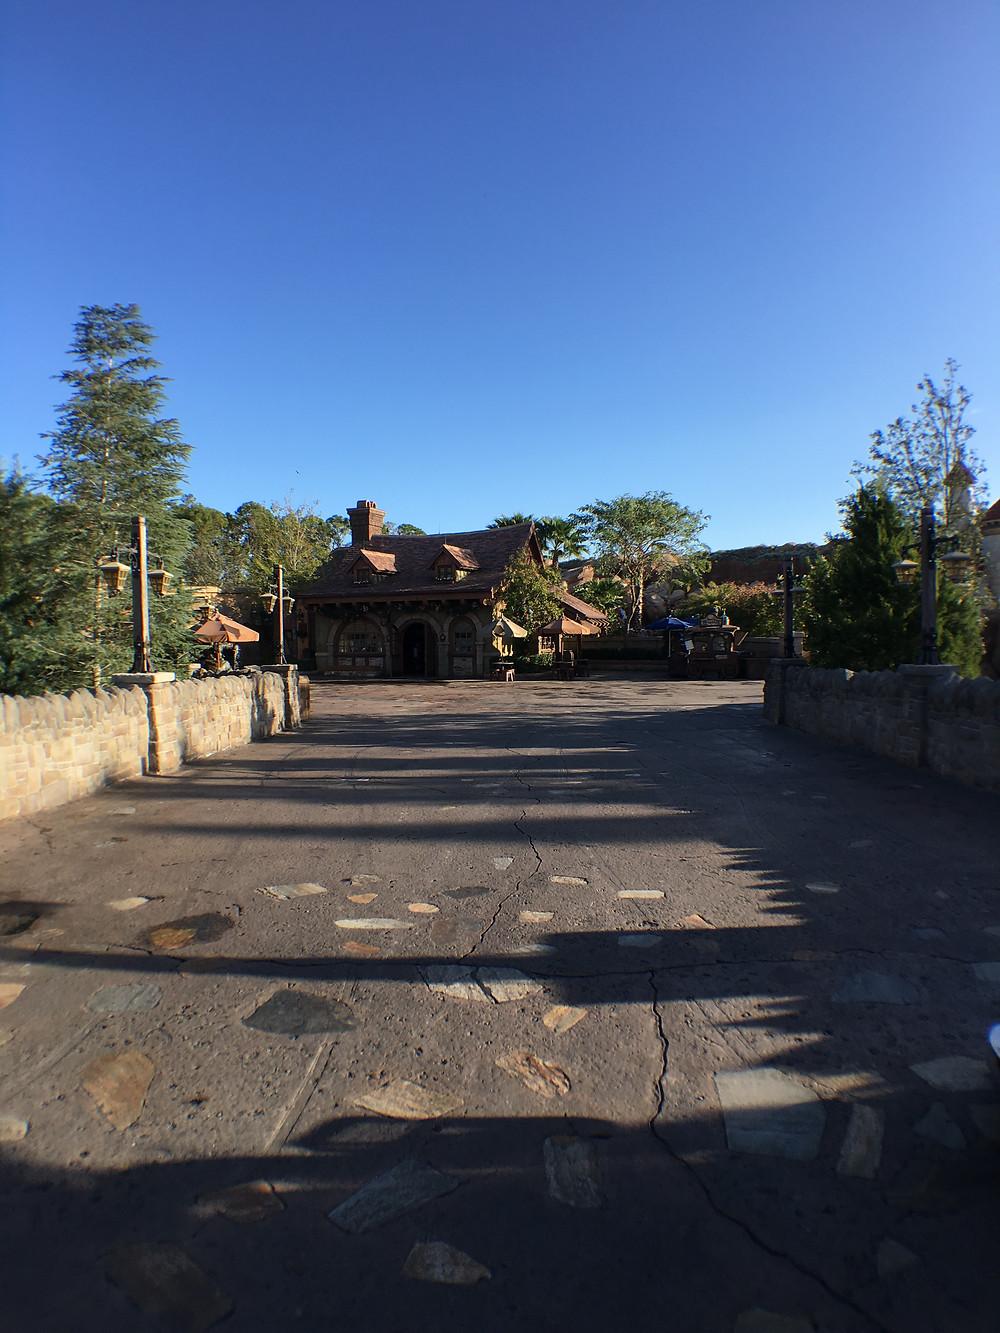 The Bridge to Belle's Village